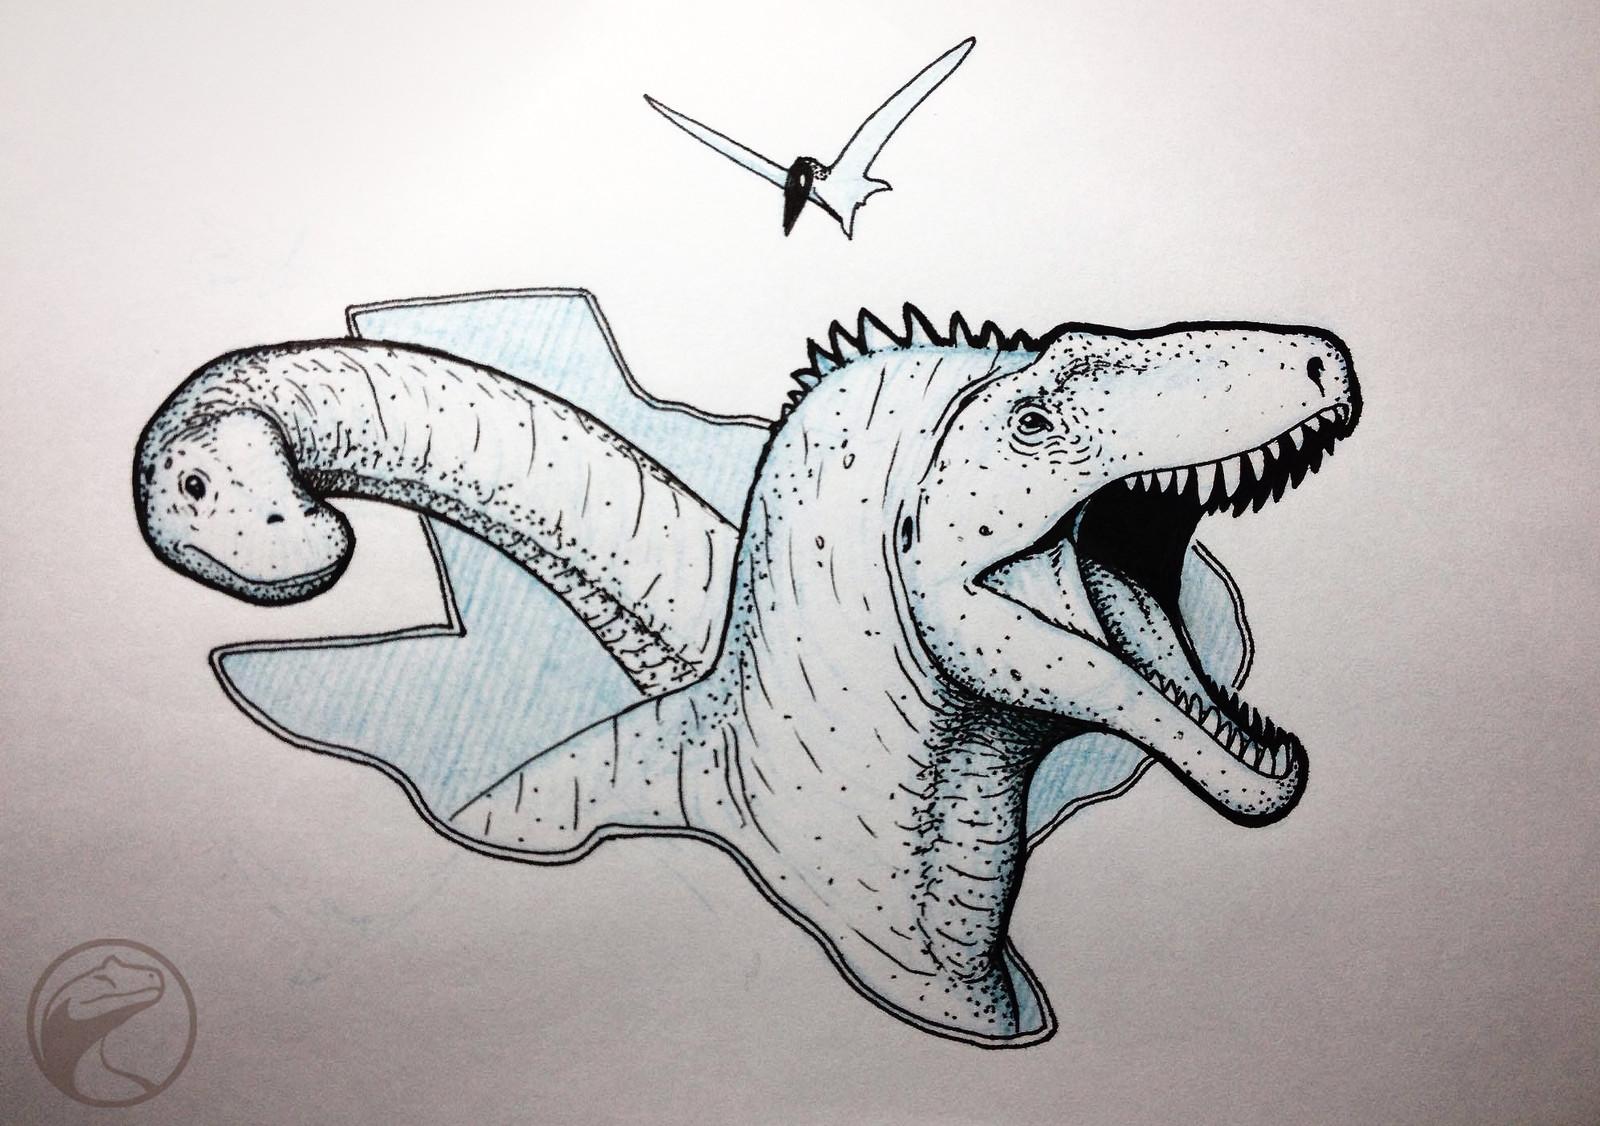 Texas Dinos: Acrocanthosaurus & Sauroposidon